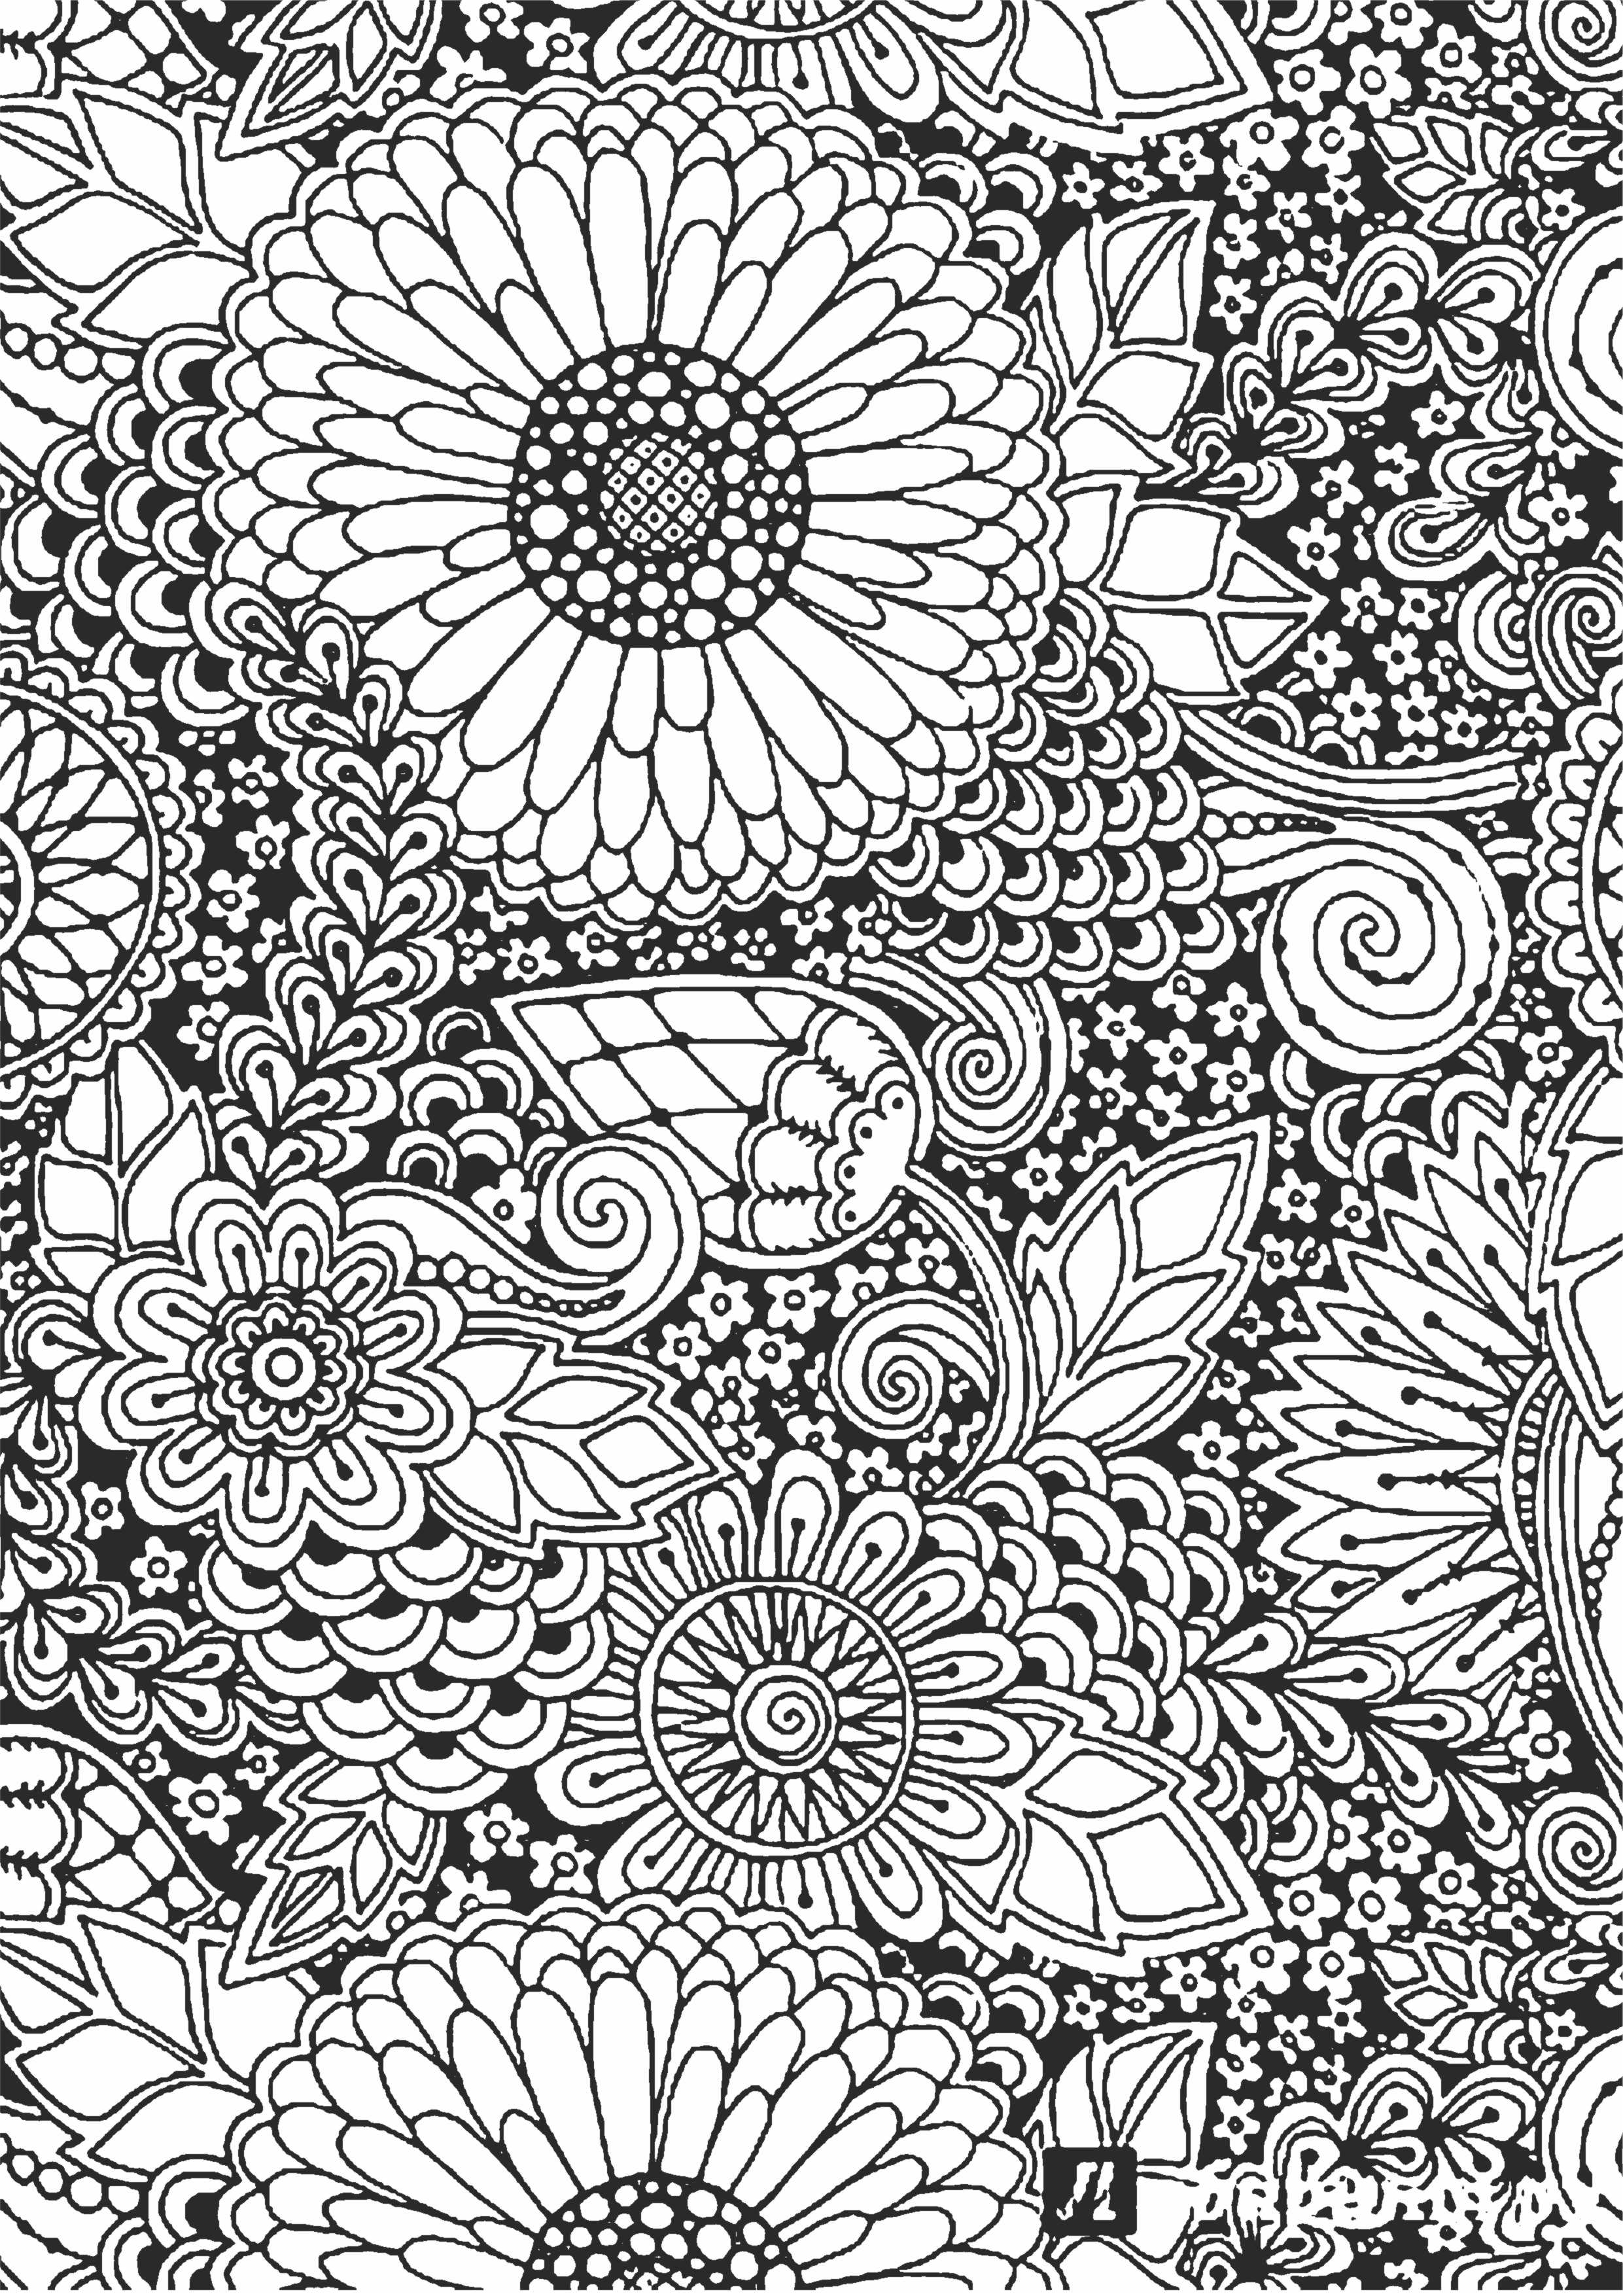 "Раскраска антистресс ""Цветы"" - Раскраски А4 формата для ..."